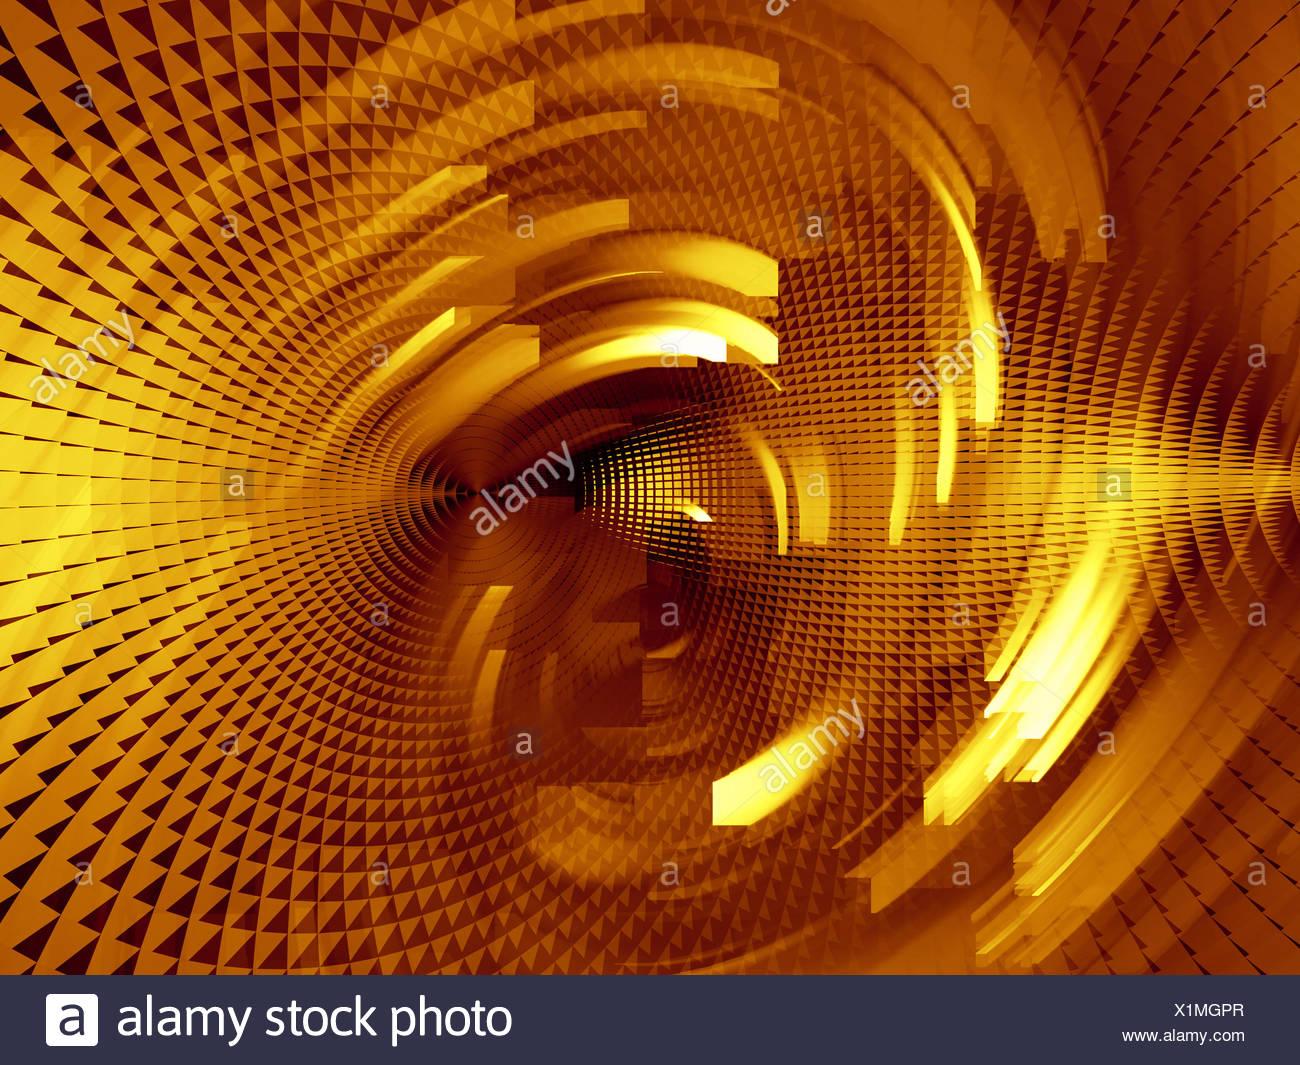 Arrangement Colour Space Golden Screen Paint Abstract